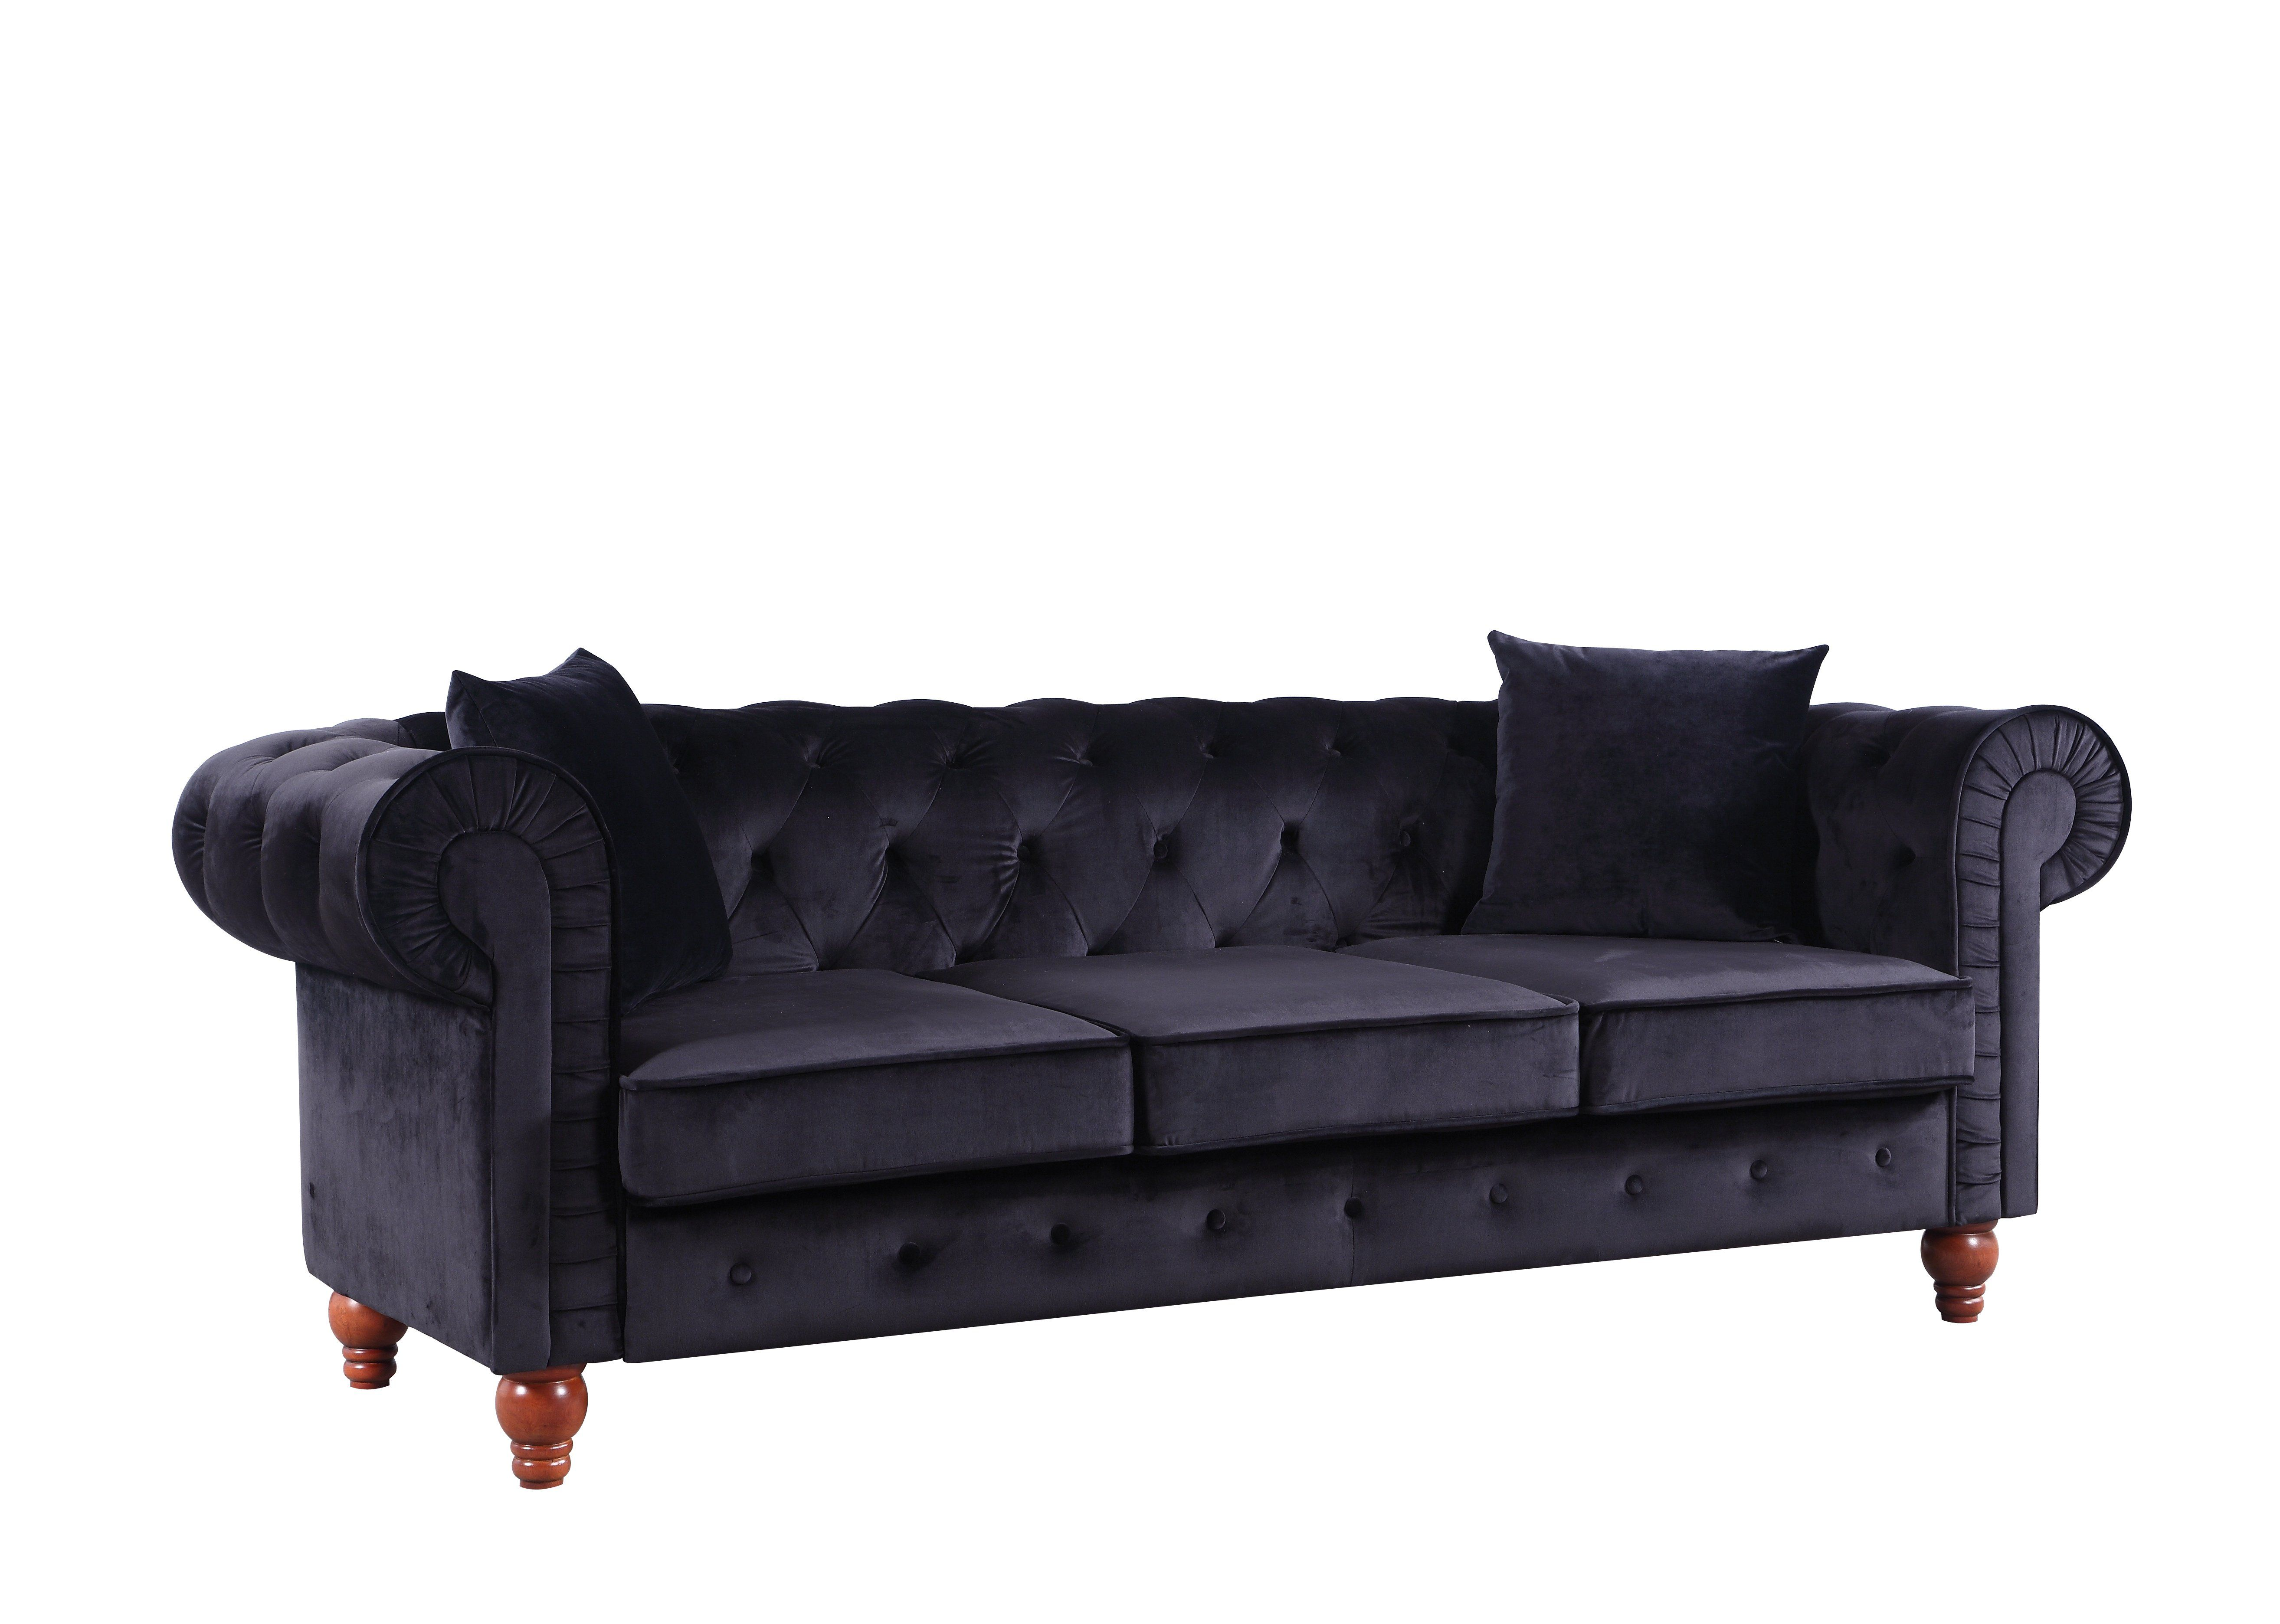 Black Velvet Chesterfield Sofa Bed Grey Corner Ebay Fabric Chocolate Brown